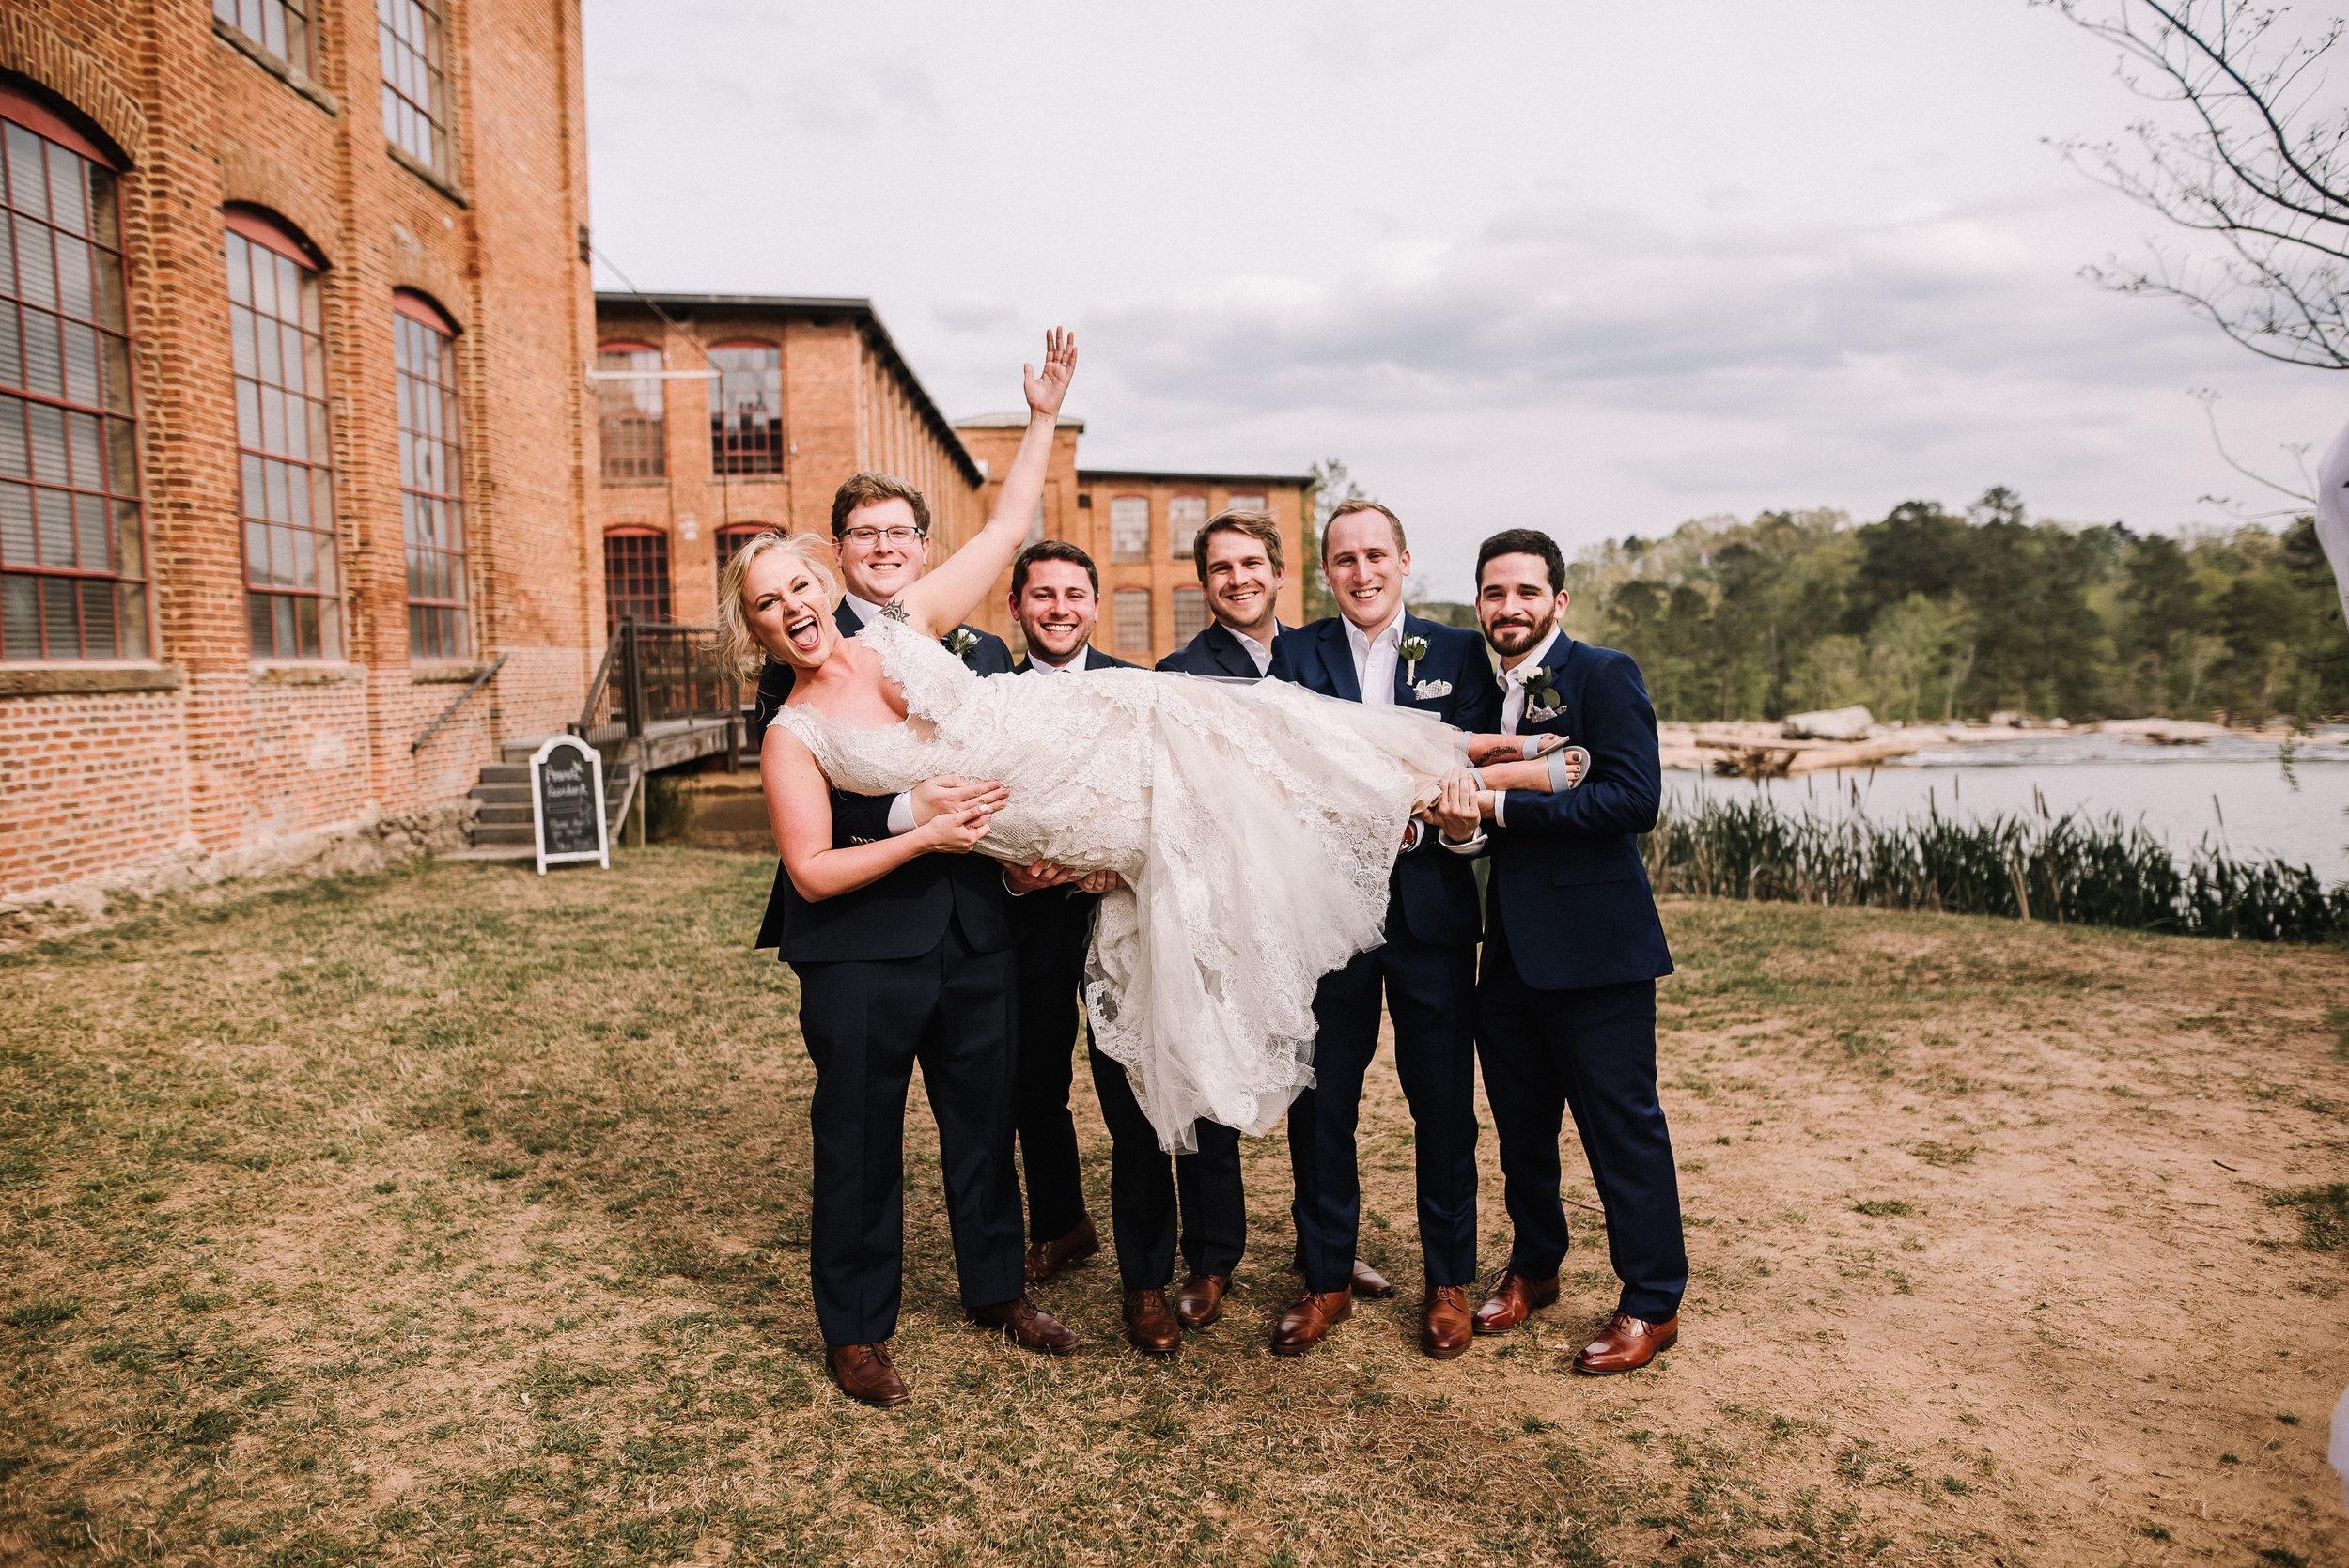 Morgan Wedding_Mill at Yellow River_Ashley Benham Photography-763.jpg